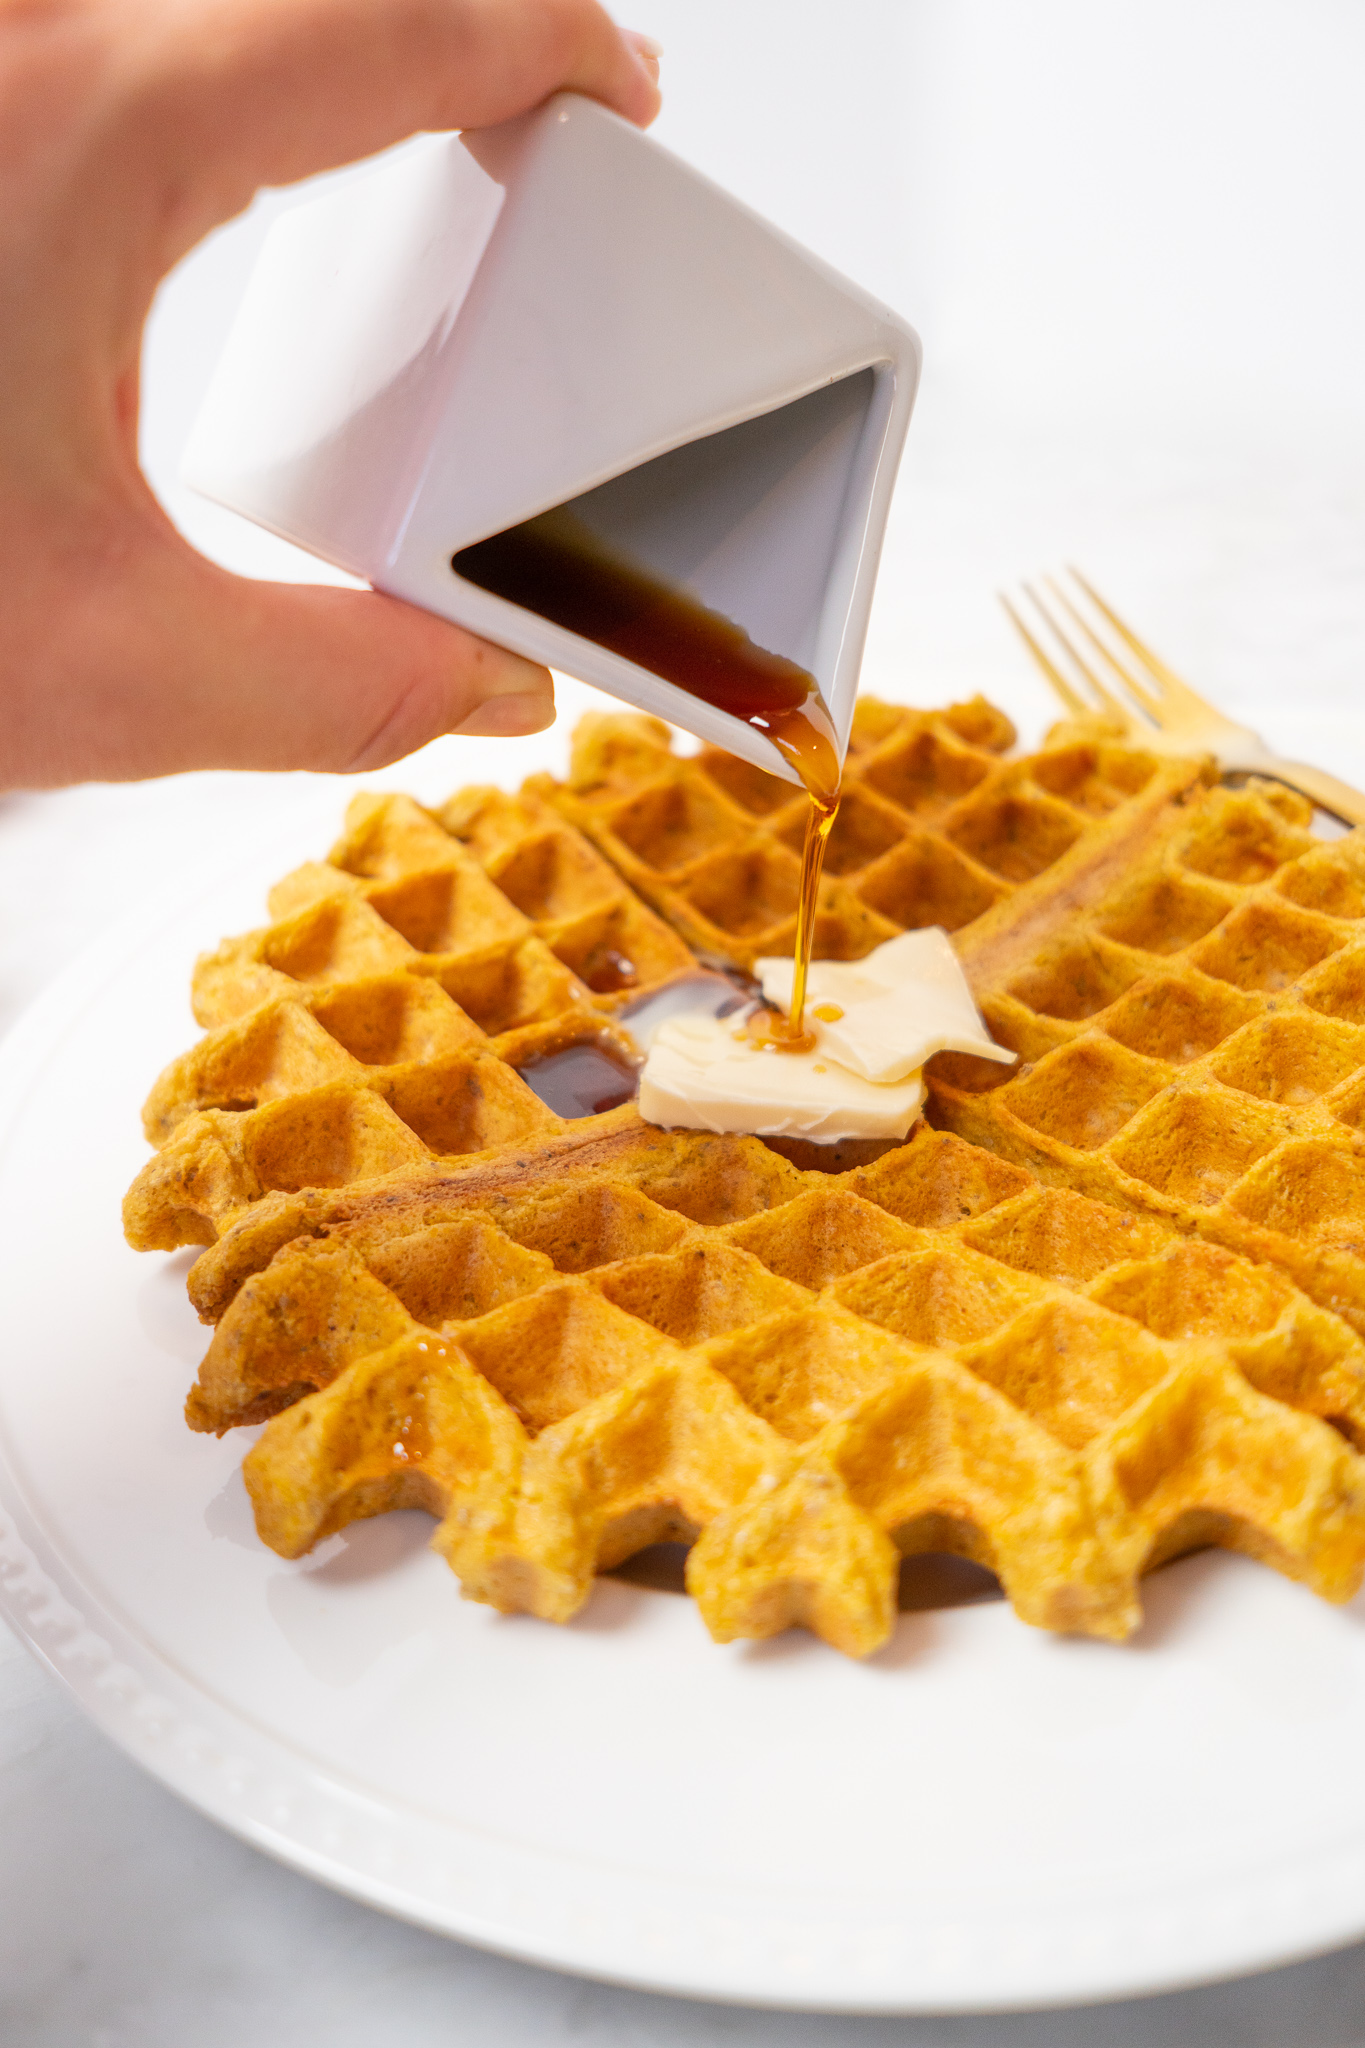 vegan gluten free waffle with sweet potato